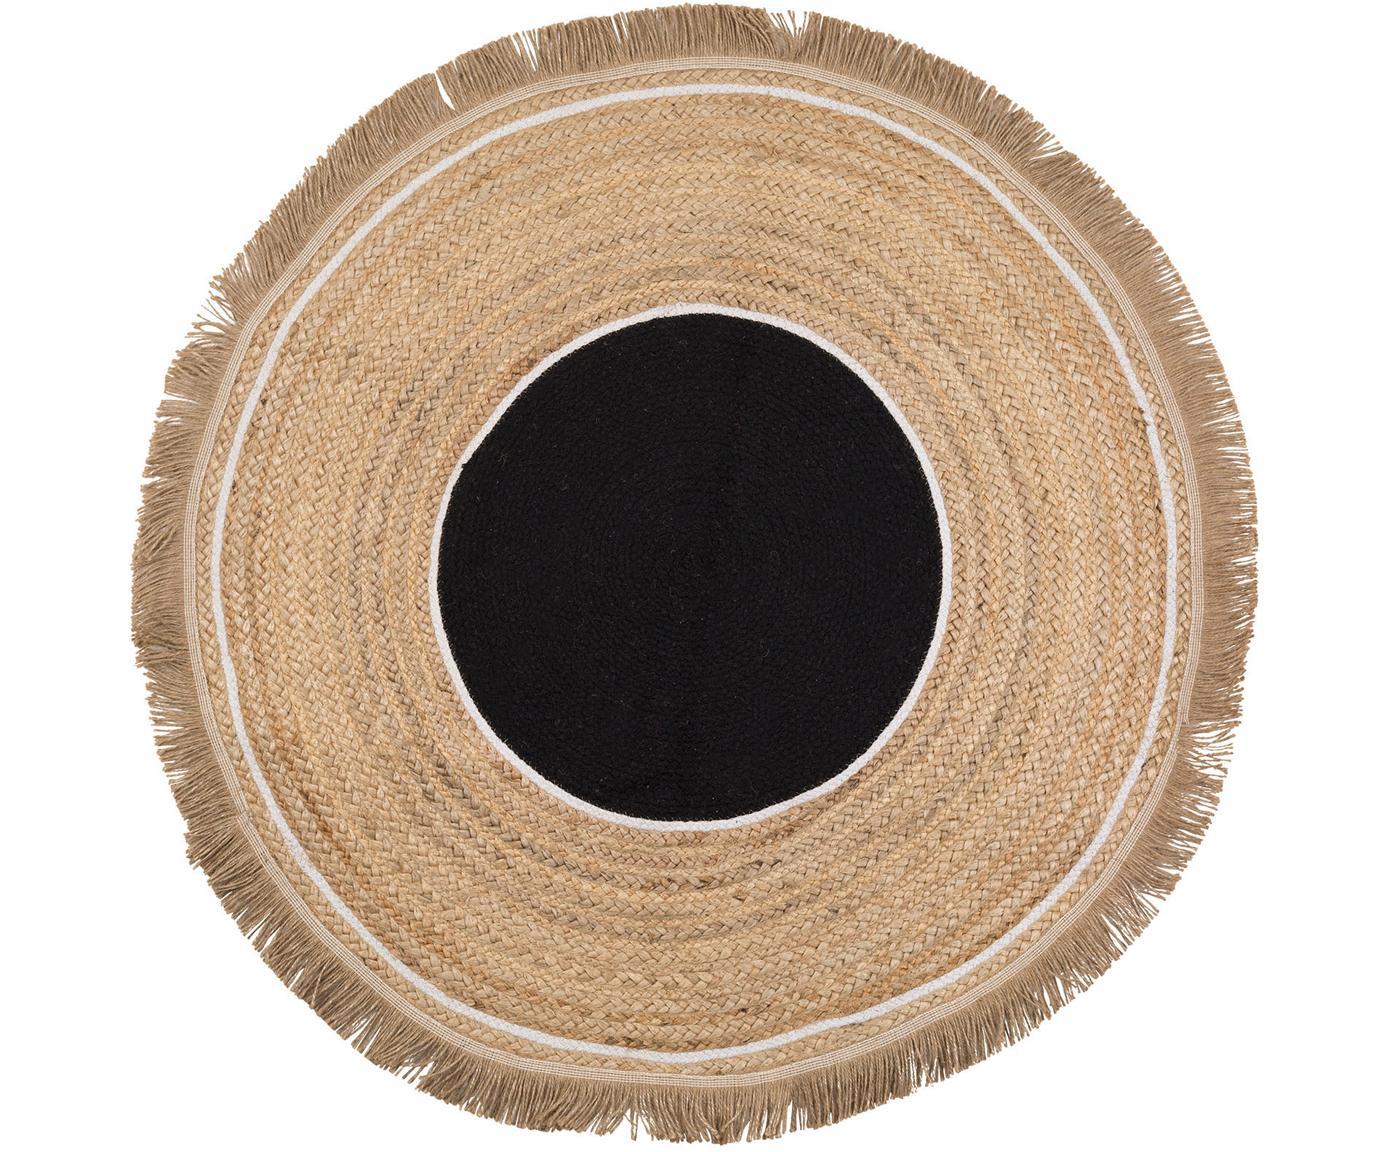 Tappeto rotondo in juta Boham, Juta, cotone, Juta, nero, bianco, Ø 100 cm (taglia XS)